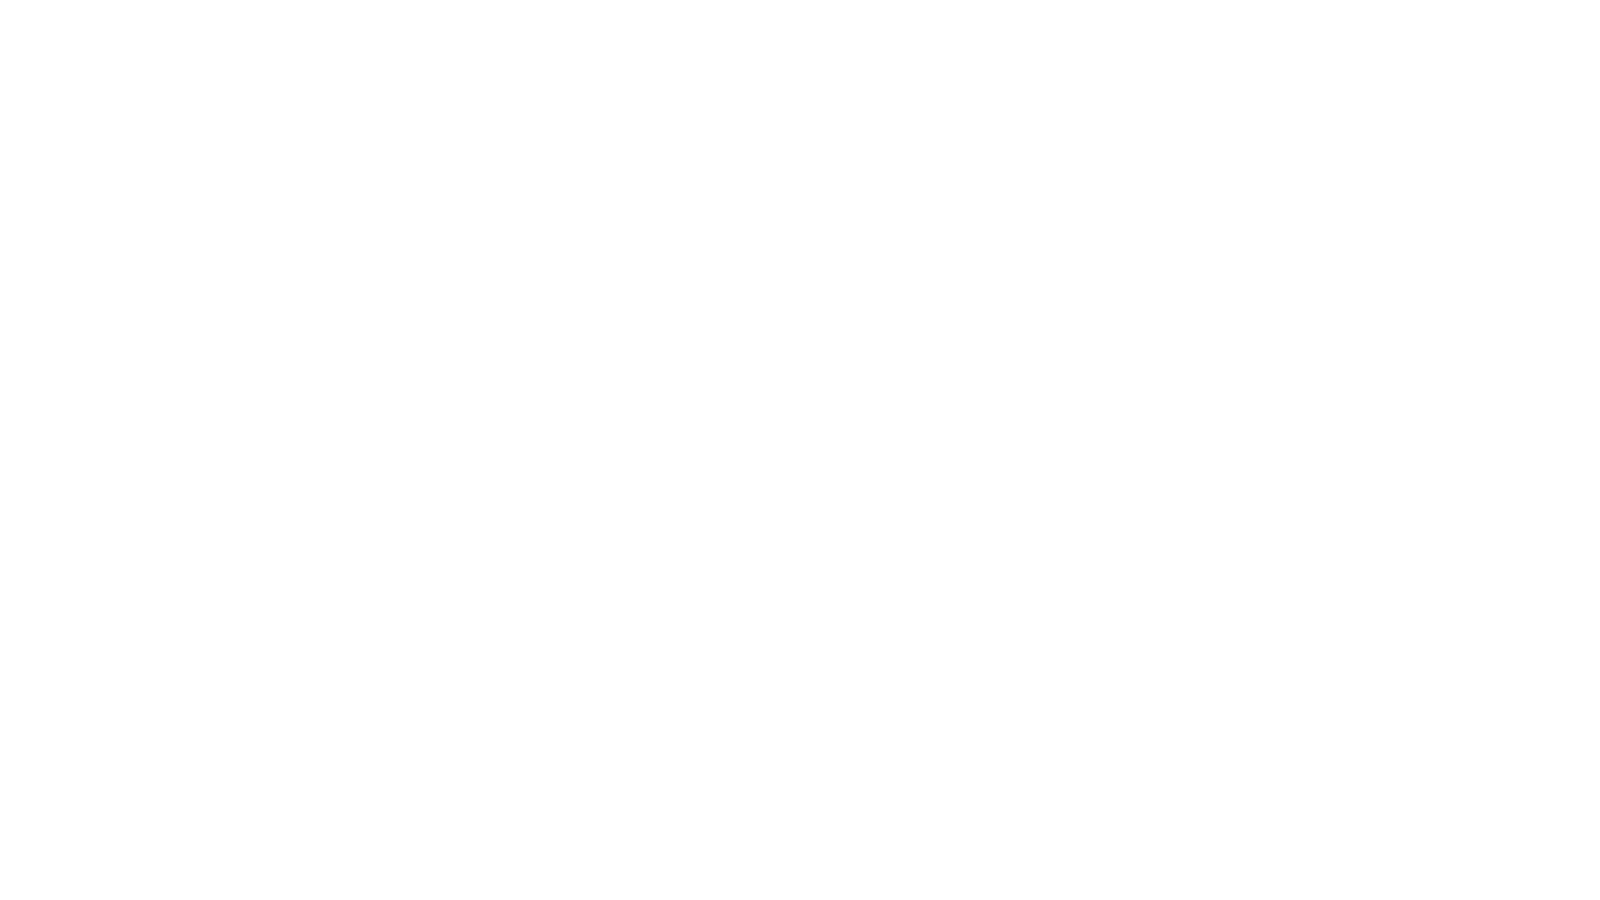 "Ngobrol Pintar di Museum Kebangkitan Nasional Podcast episode 4 kali ini mengangkat tema ""Kilas Balik Gaya Lukisan Maestro Basoeki Abdullah pada Lukisan Wahidin Soedirohoesoedo"". Dengan menghadirkan dua narasumber, yaitu Vikey Yordan dari pihak keluarga pelukis Basoeki Abdullah, dan Dian Ardianto yang merupakan kurator dari Museum Basoeki Abdullah. . . Dengan dimoderatori oleh Juniawan Dahlan, podcast kali ini memberikan sajian terkait gaya lukisan dari salah satu koleksi Museum Kebangkitan Nasional yaitu lukisan tokoh Dokter Wahidin Soedirohoesoedo. Lukisan ini dilukis oleh cucunya sendiri yaitu maestro Basoeki Abdullah. . . Jangan lupa untuk like, comment, dan subscribe channel Youtube Museum Kebangkitan Nasional ya! . . Ikuti kami juga di : Instagram : https://www.instagram.com/muskitnasofficial/ Facebook : https://web.facebook.com/muskitnas1908.id/ Website : http://muskitnas.net/ . . Video Editor: @imazy_motion"